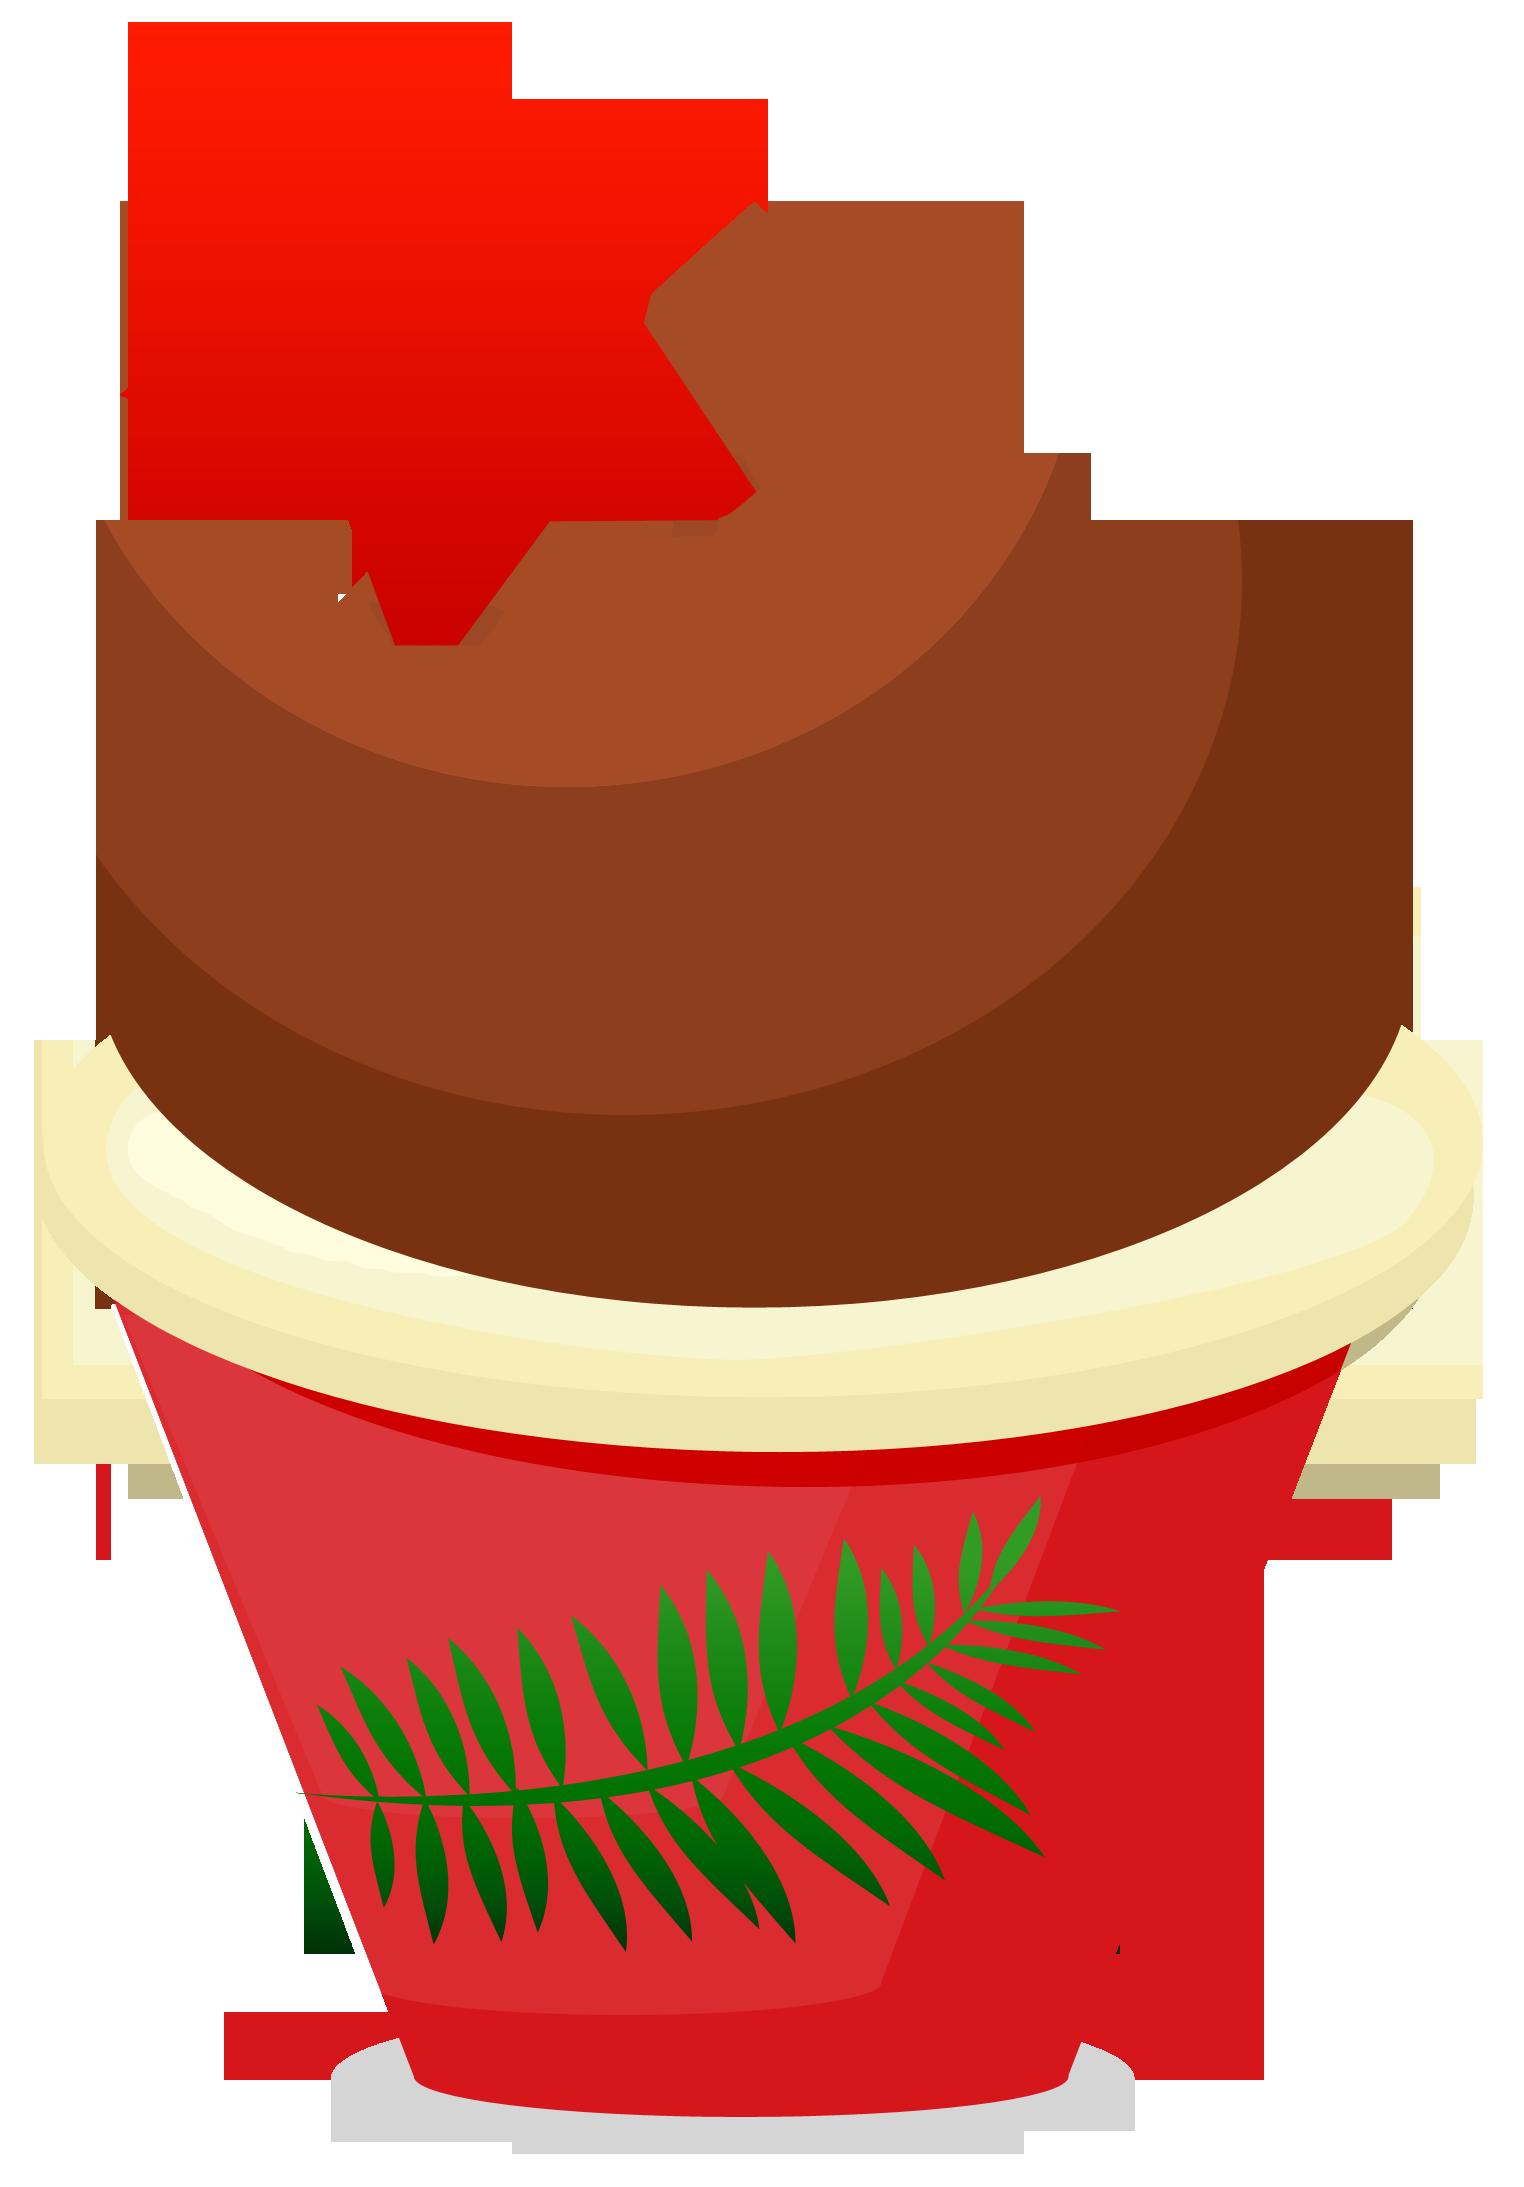 jpg transparent stock Brownie cupcake free on. Brownies clipart clip art.